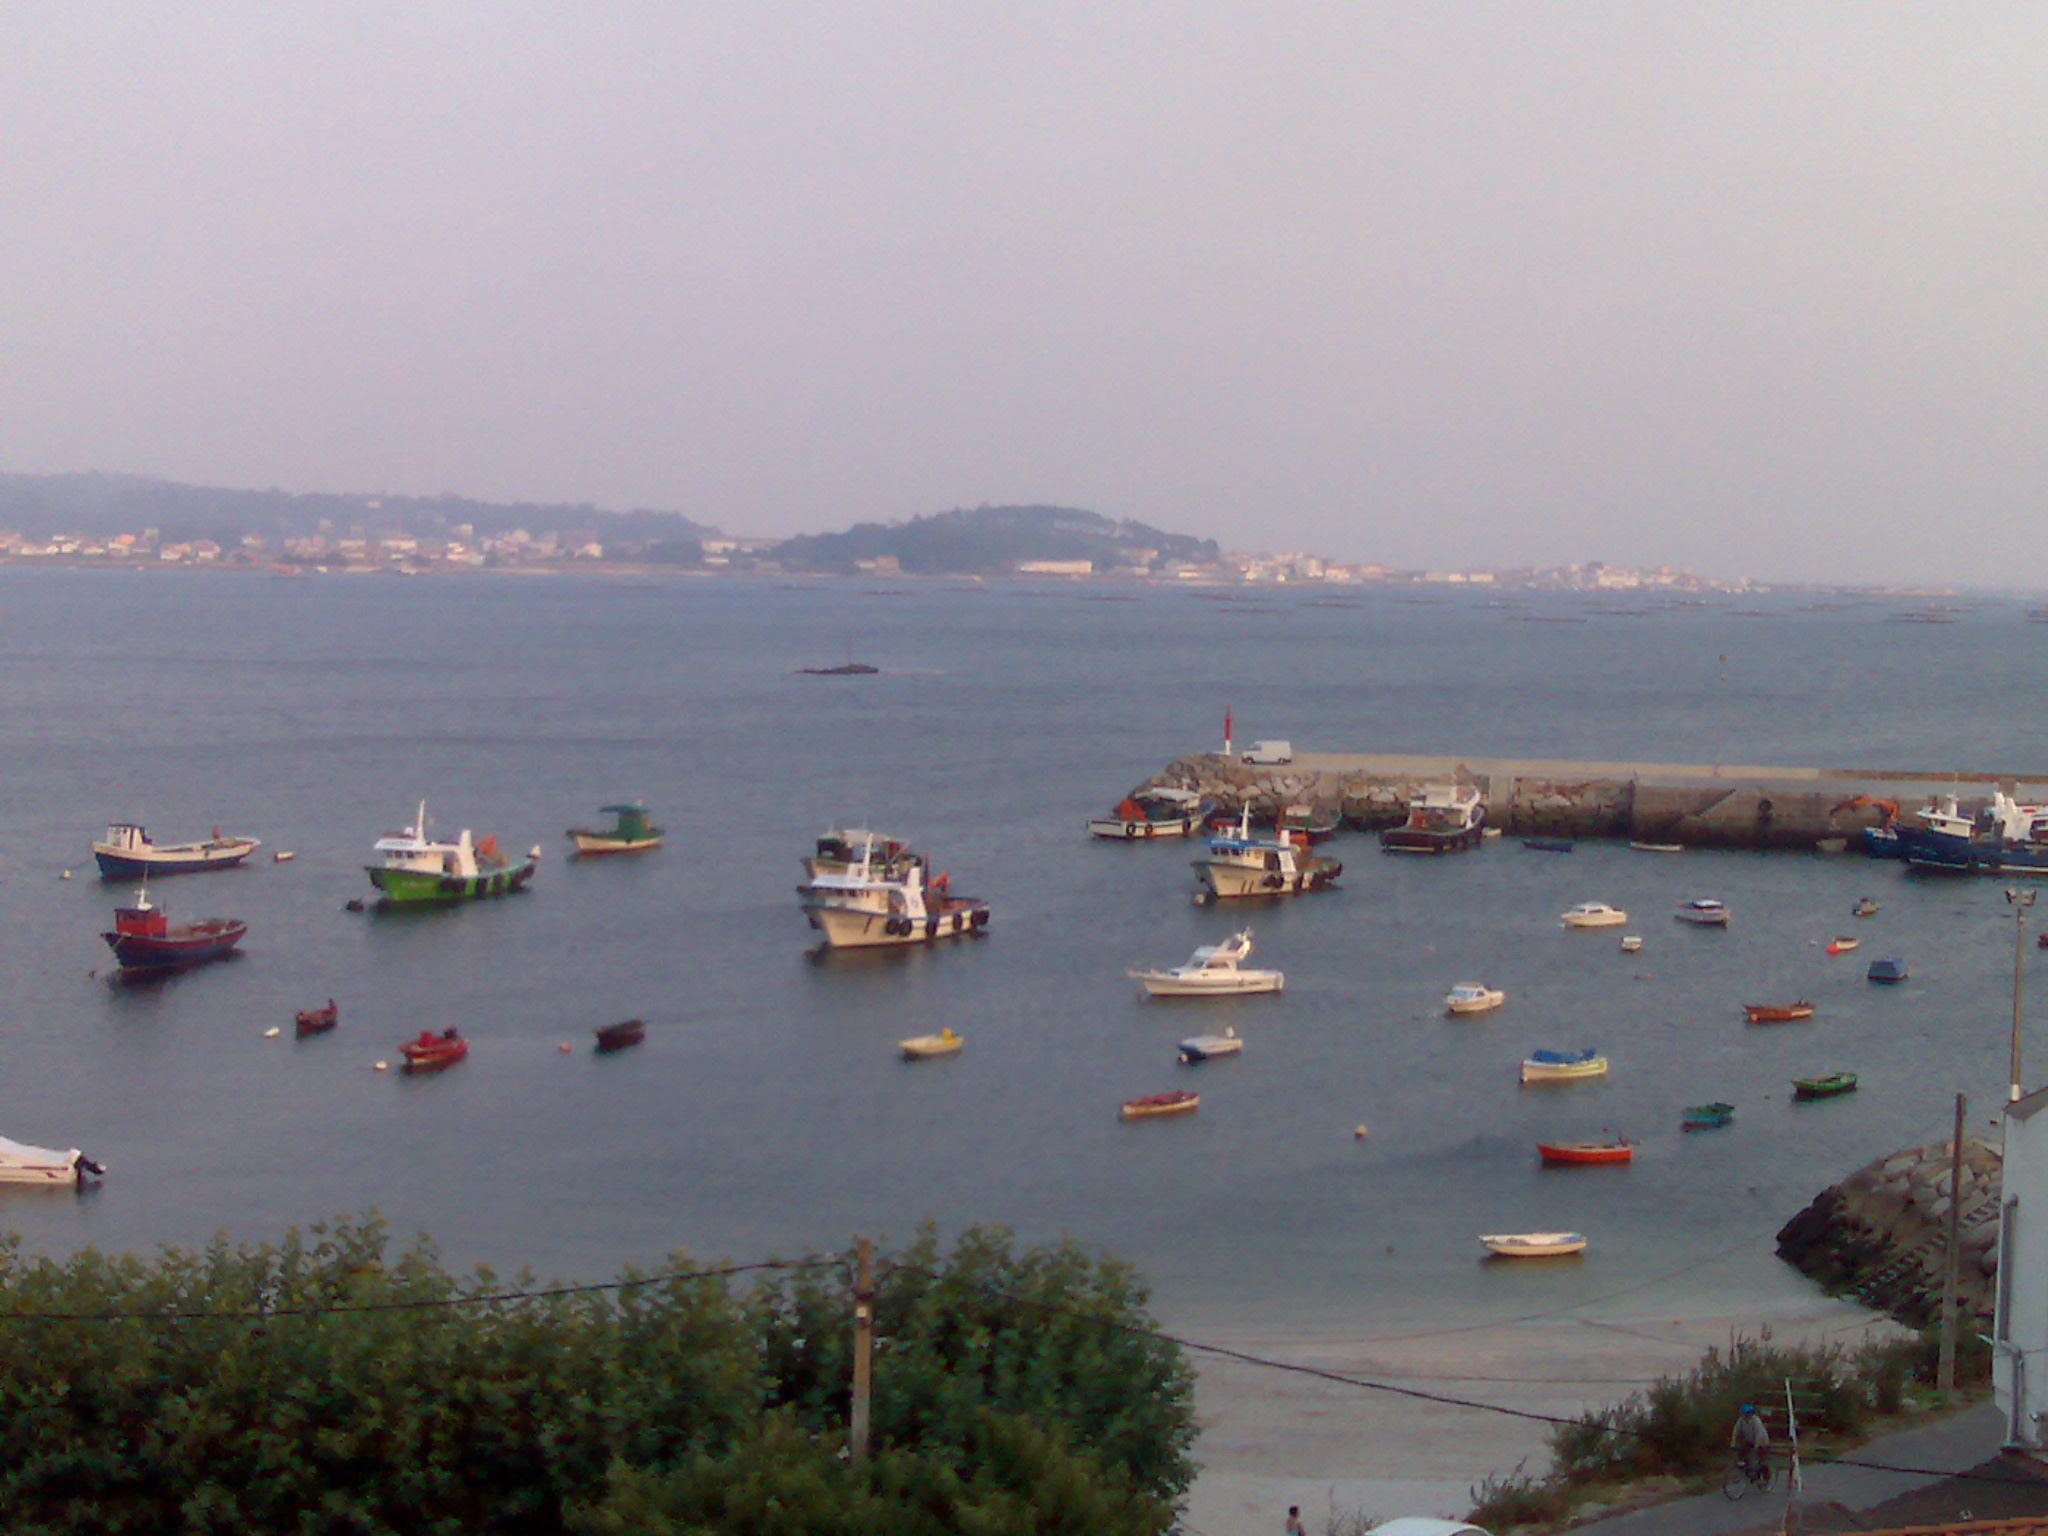 Playa Toxal